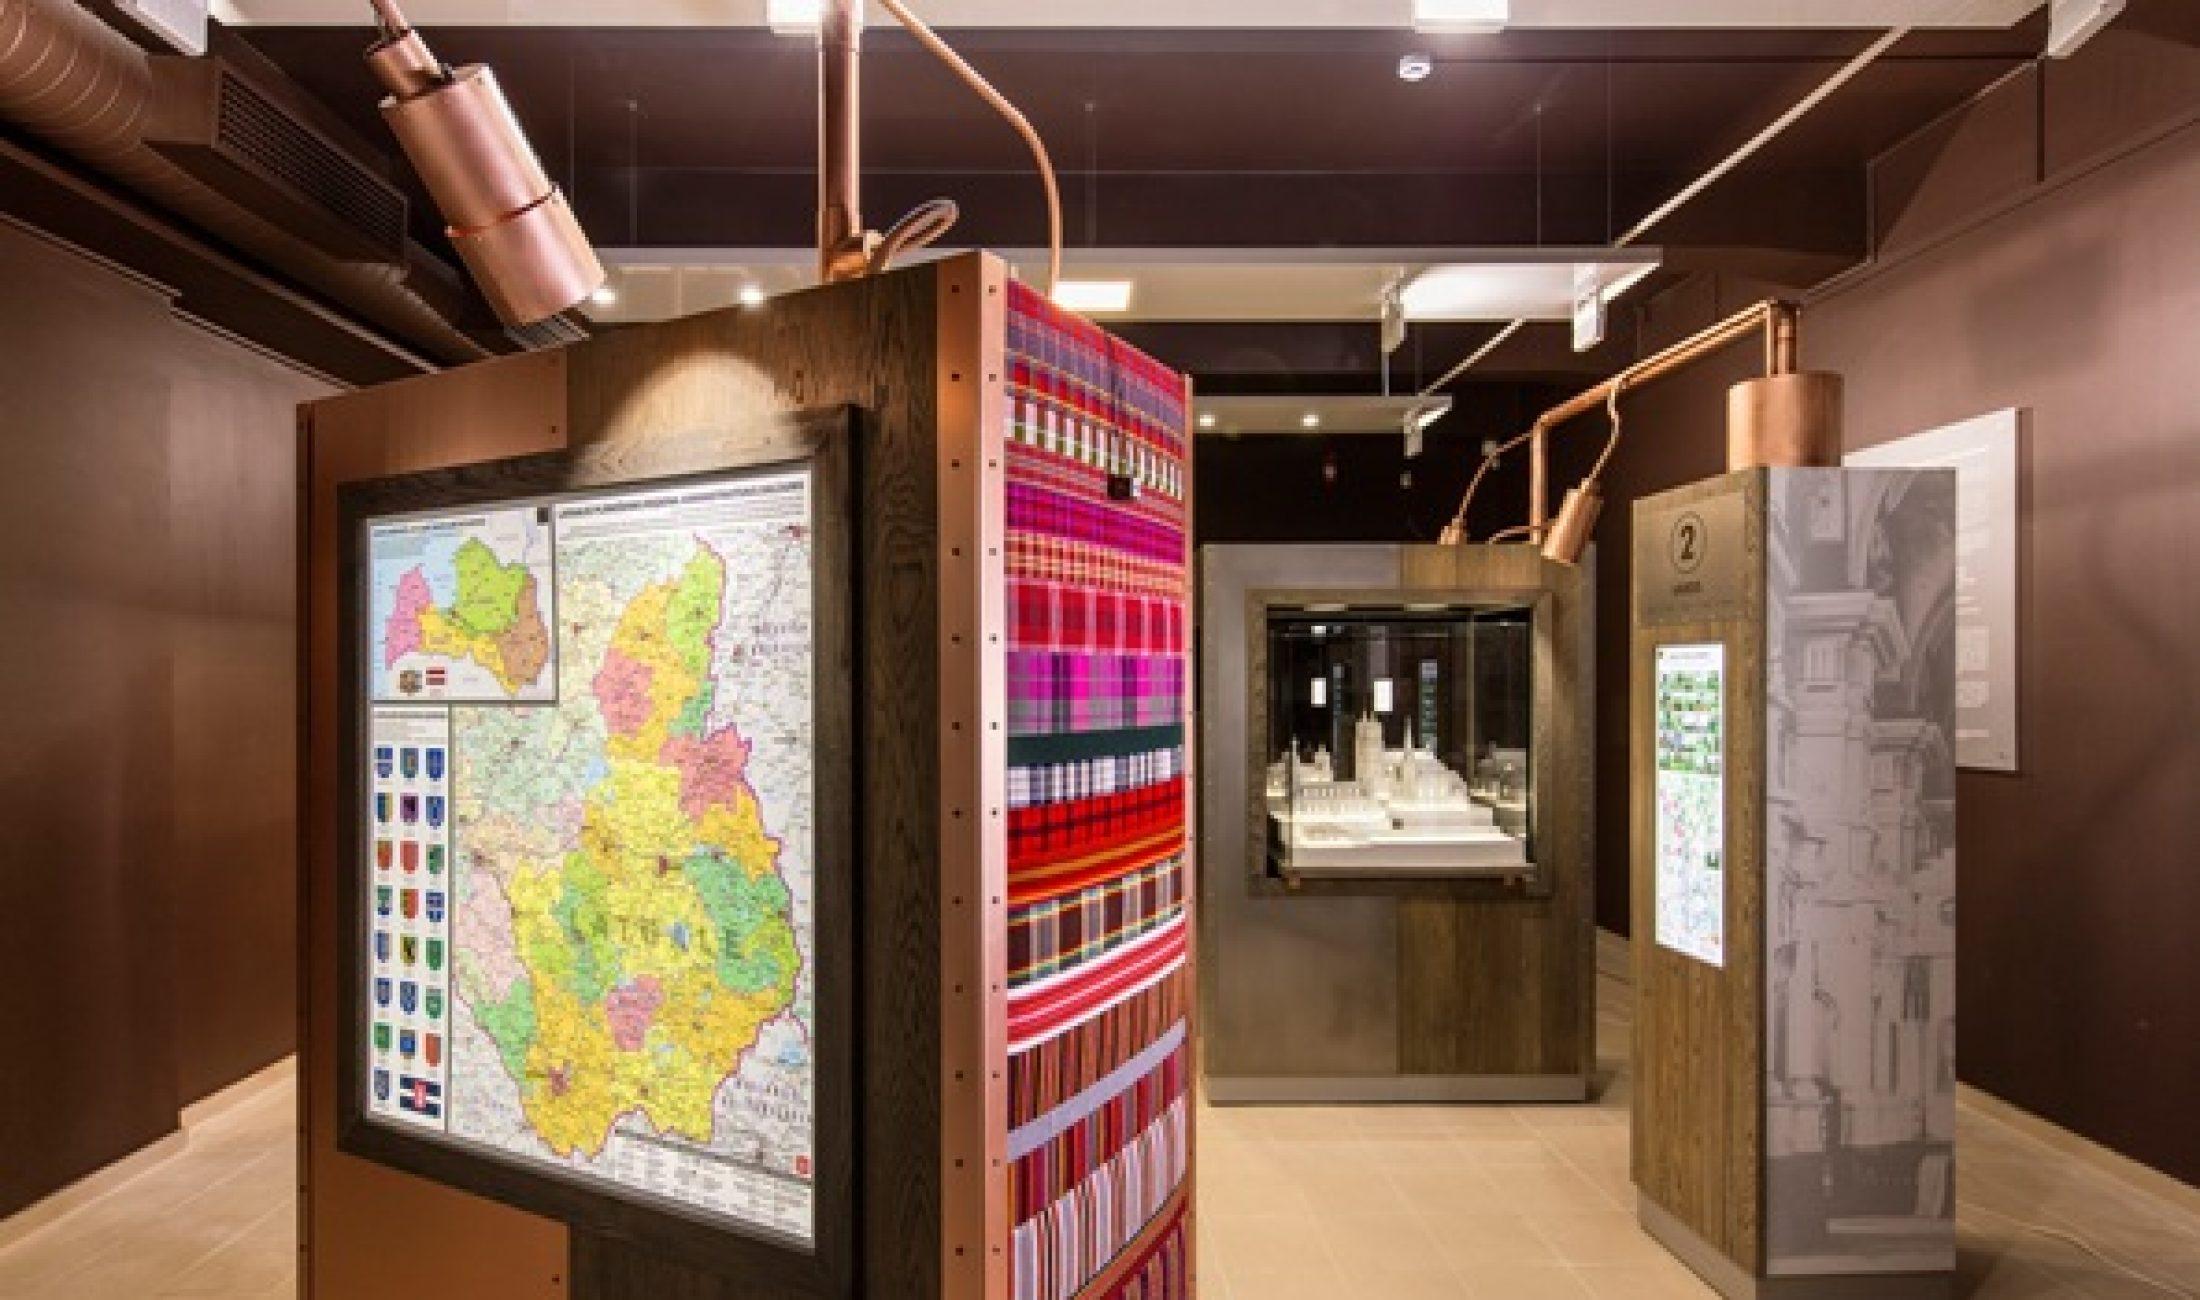 Šmakovkys muzejs aicynoj iz goda jubileja nūtikšonom